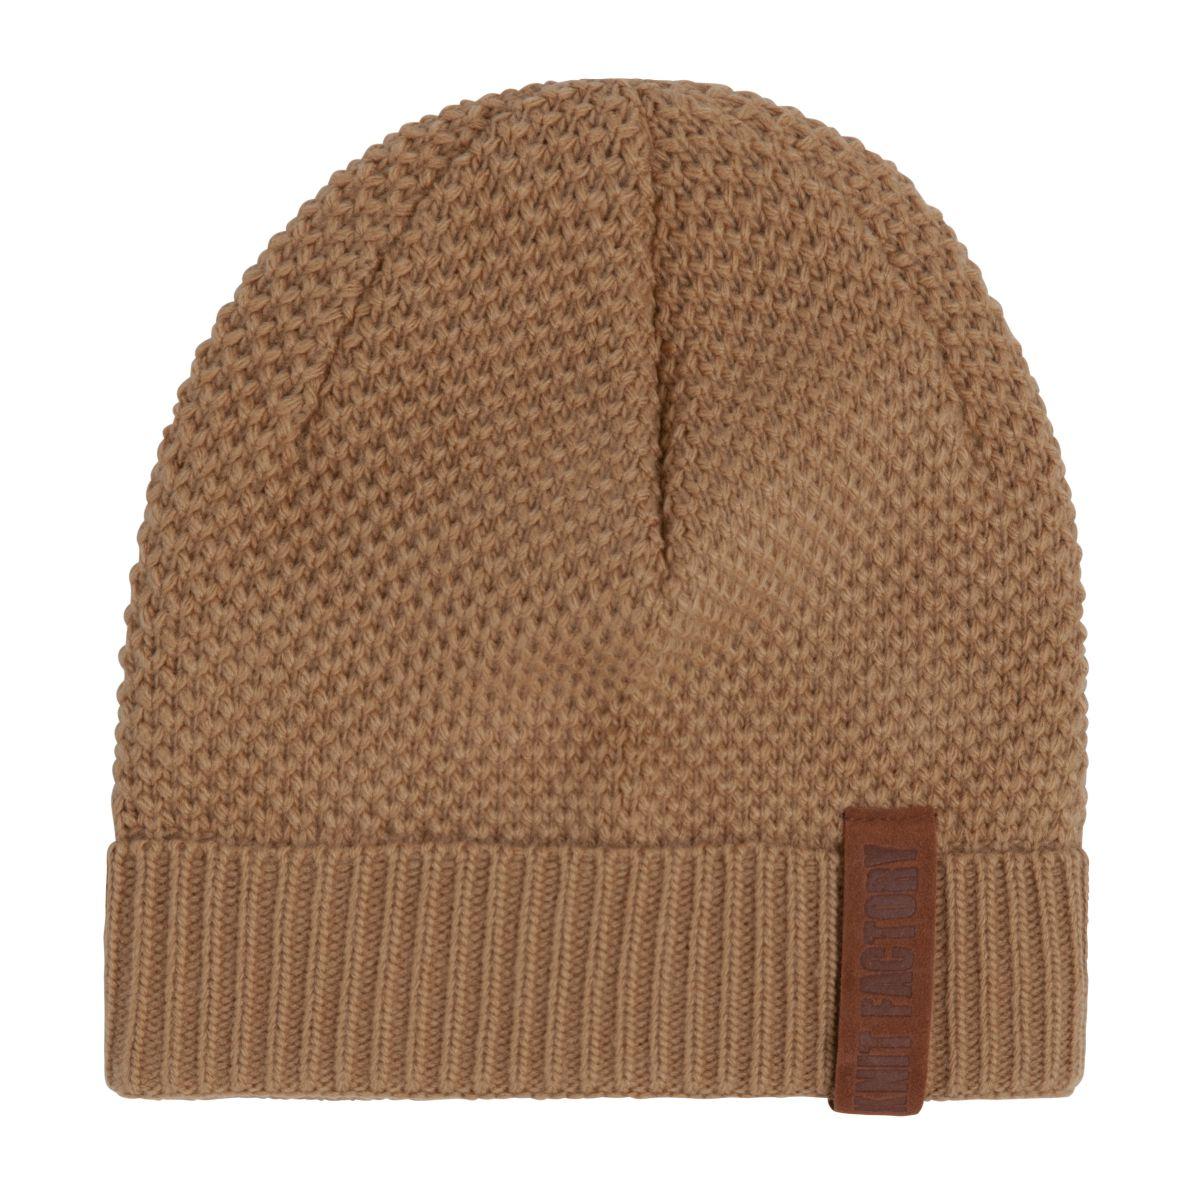 knit factory 1237020 jazz beanie new camel 1